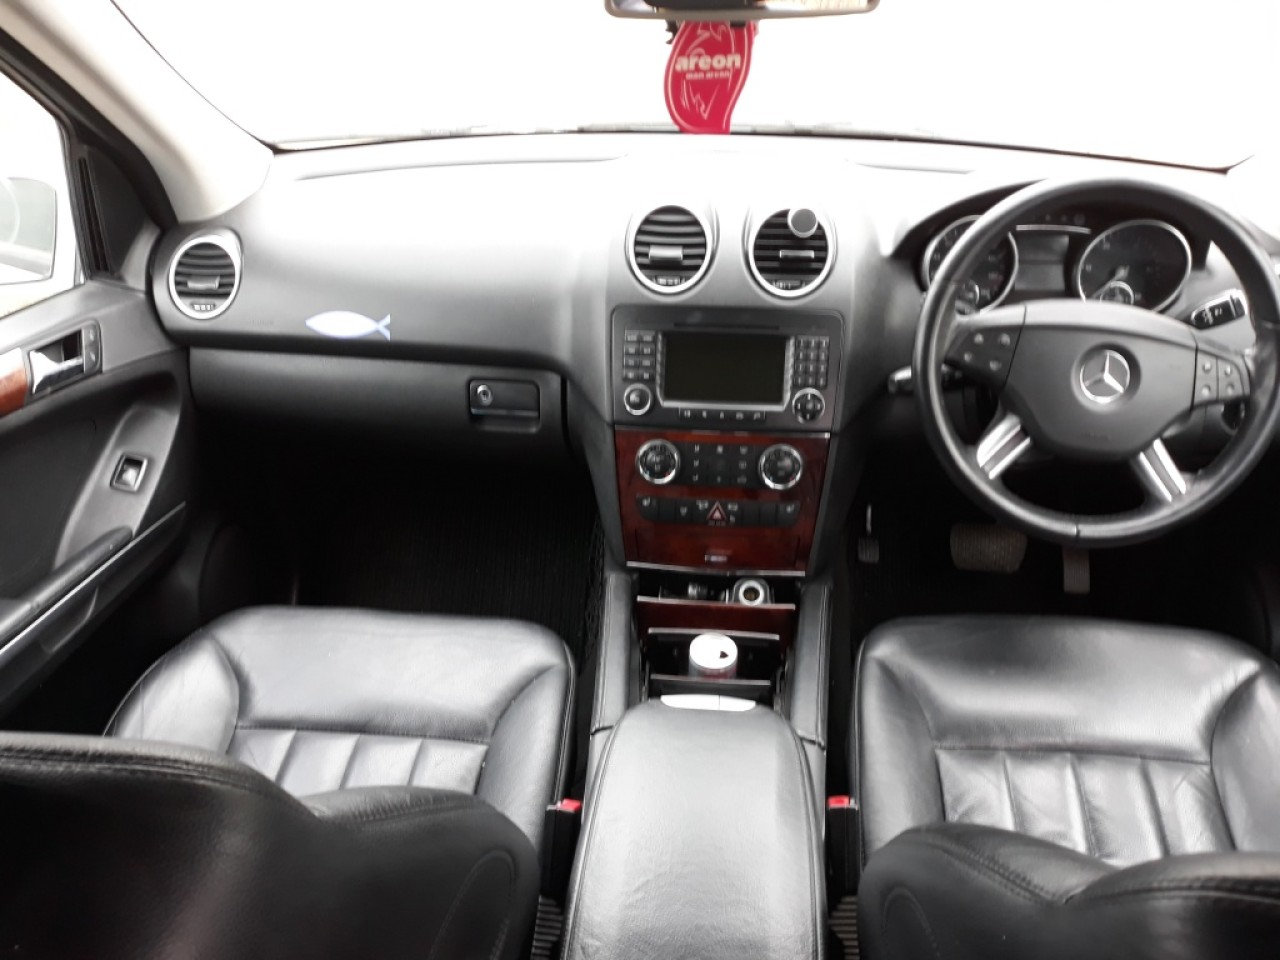 Cotiera Mercedes M-CLASS W164 2007 SUV 3.0